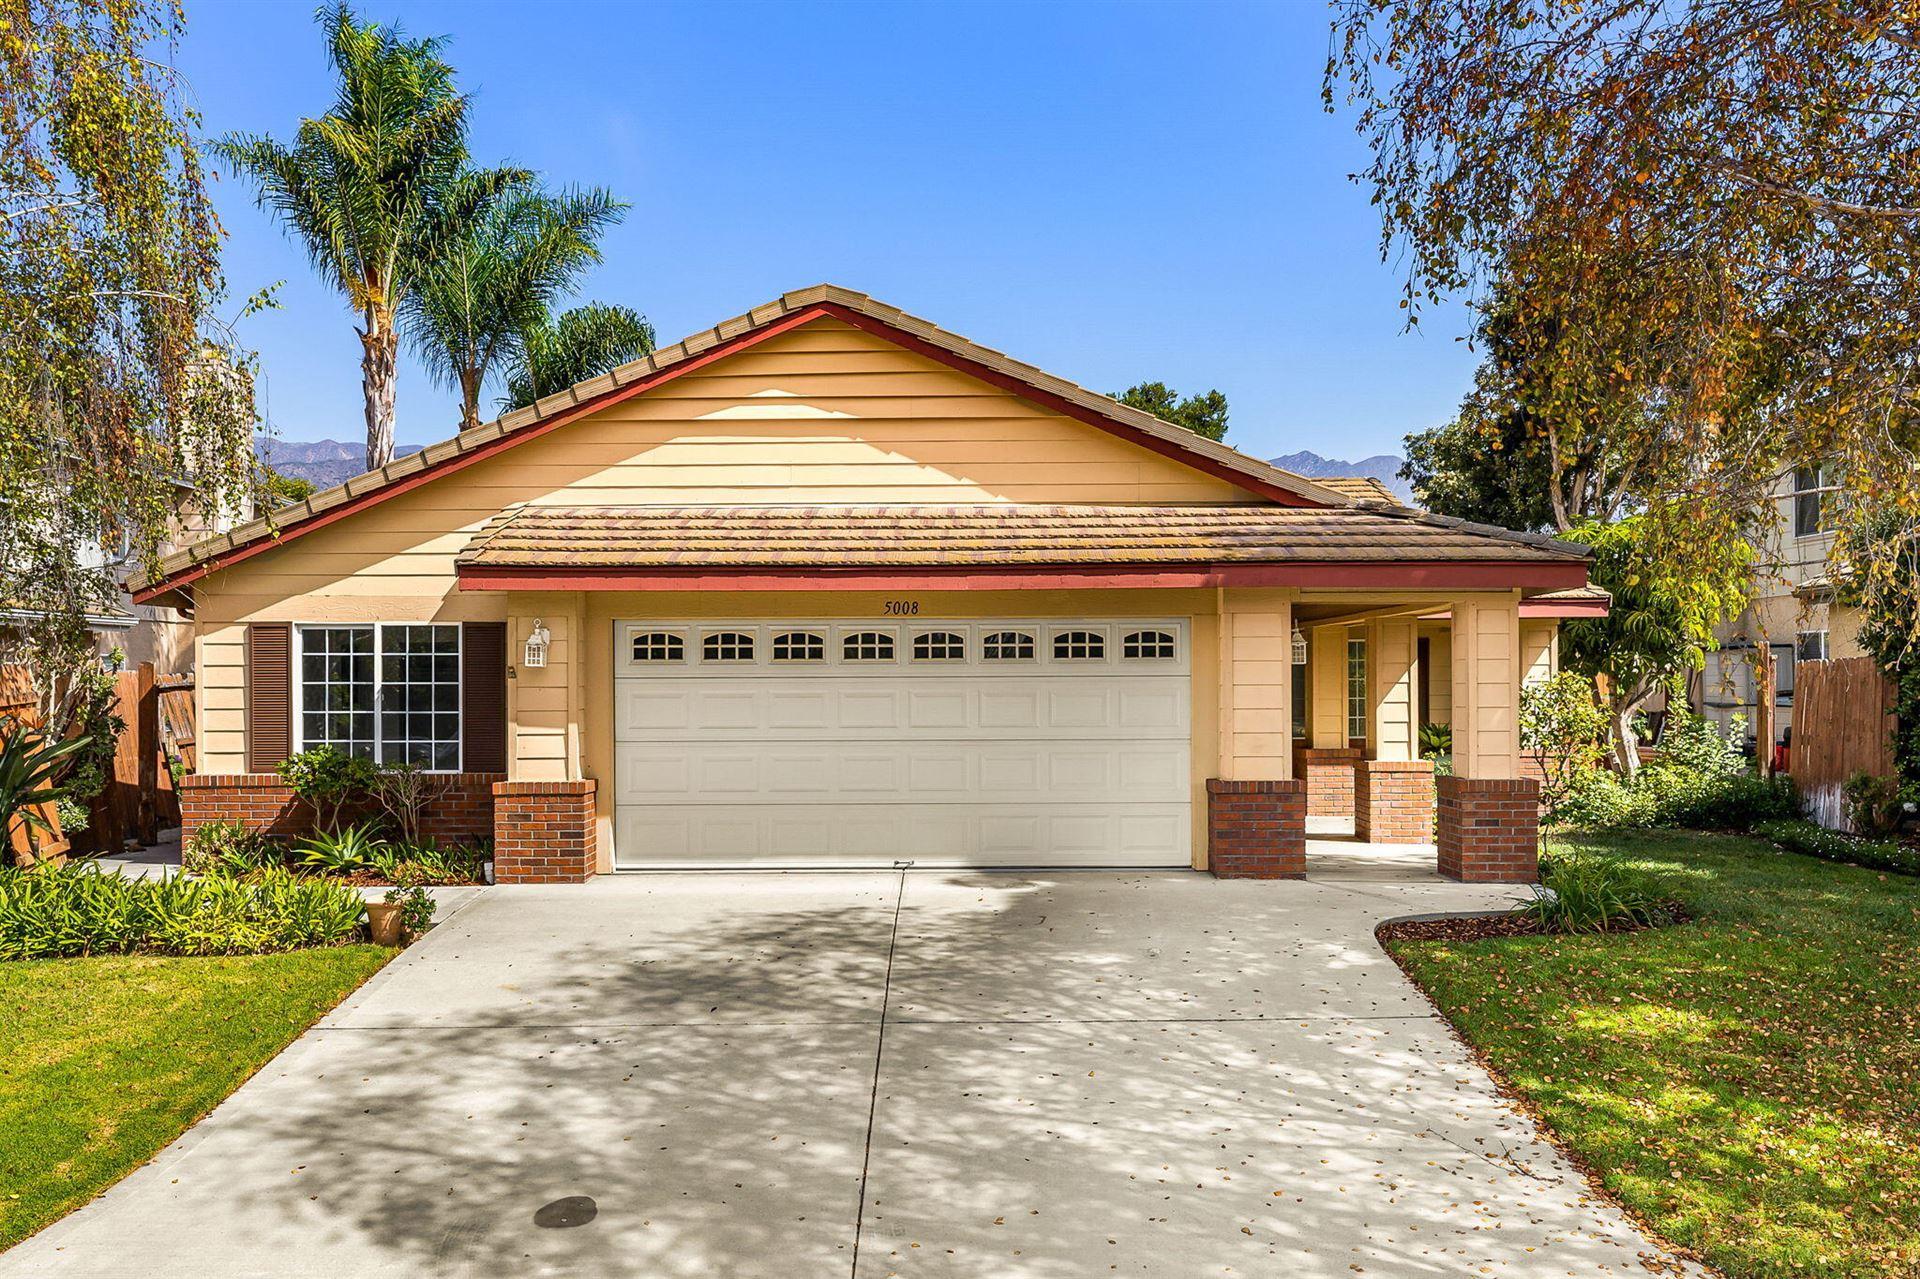 5008 Pacific Village Dr, Carpinteria, CA 93013 - MLS#: 21-3453